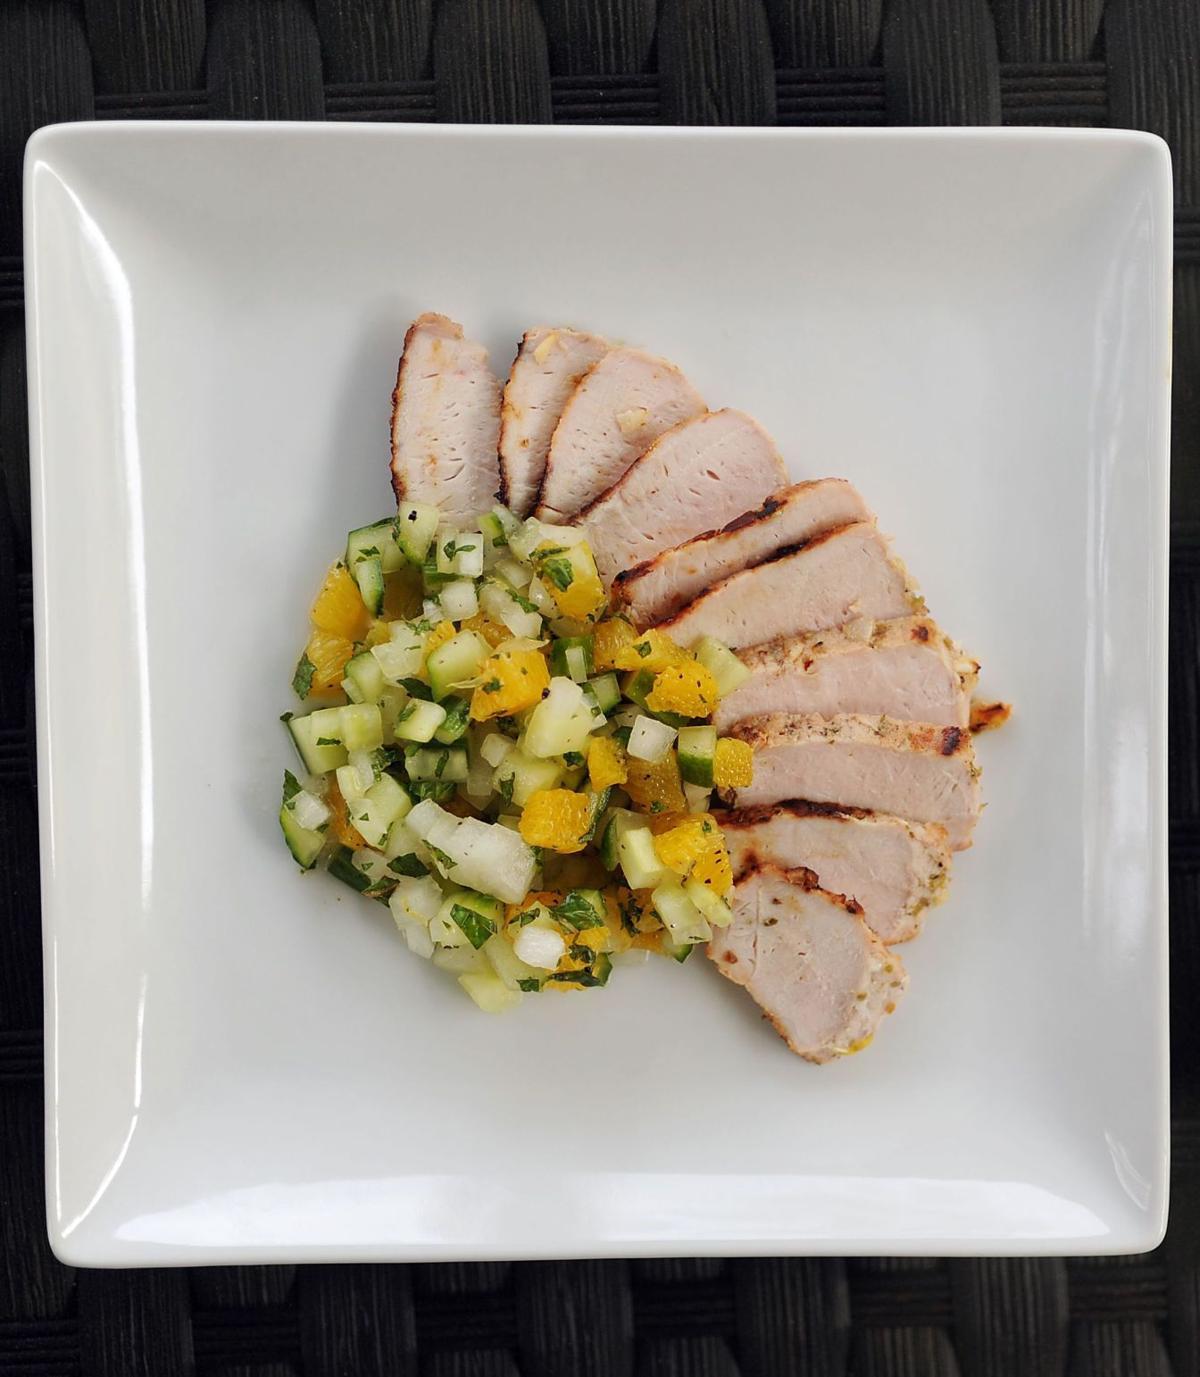 Cool cucumber balances garlic in tasty pork dish